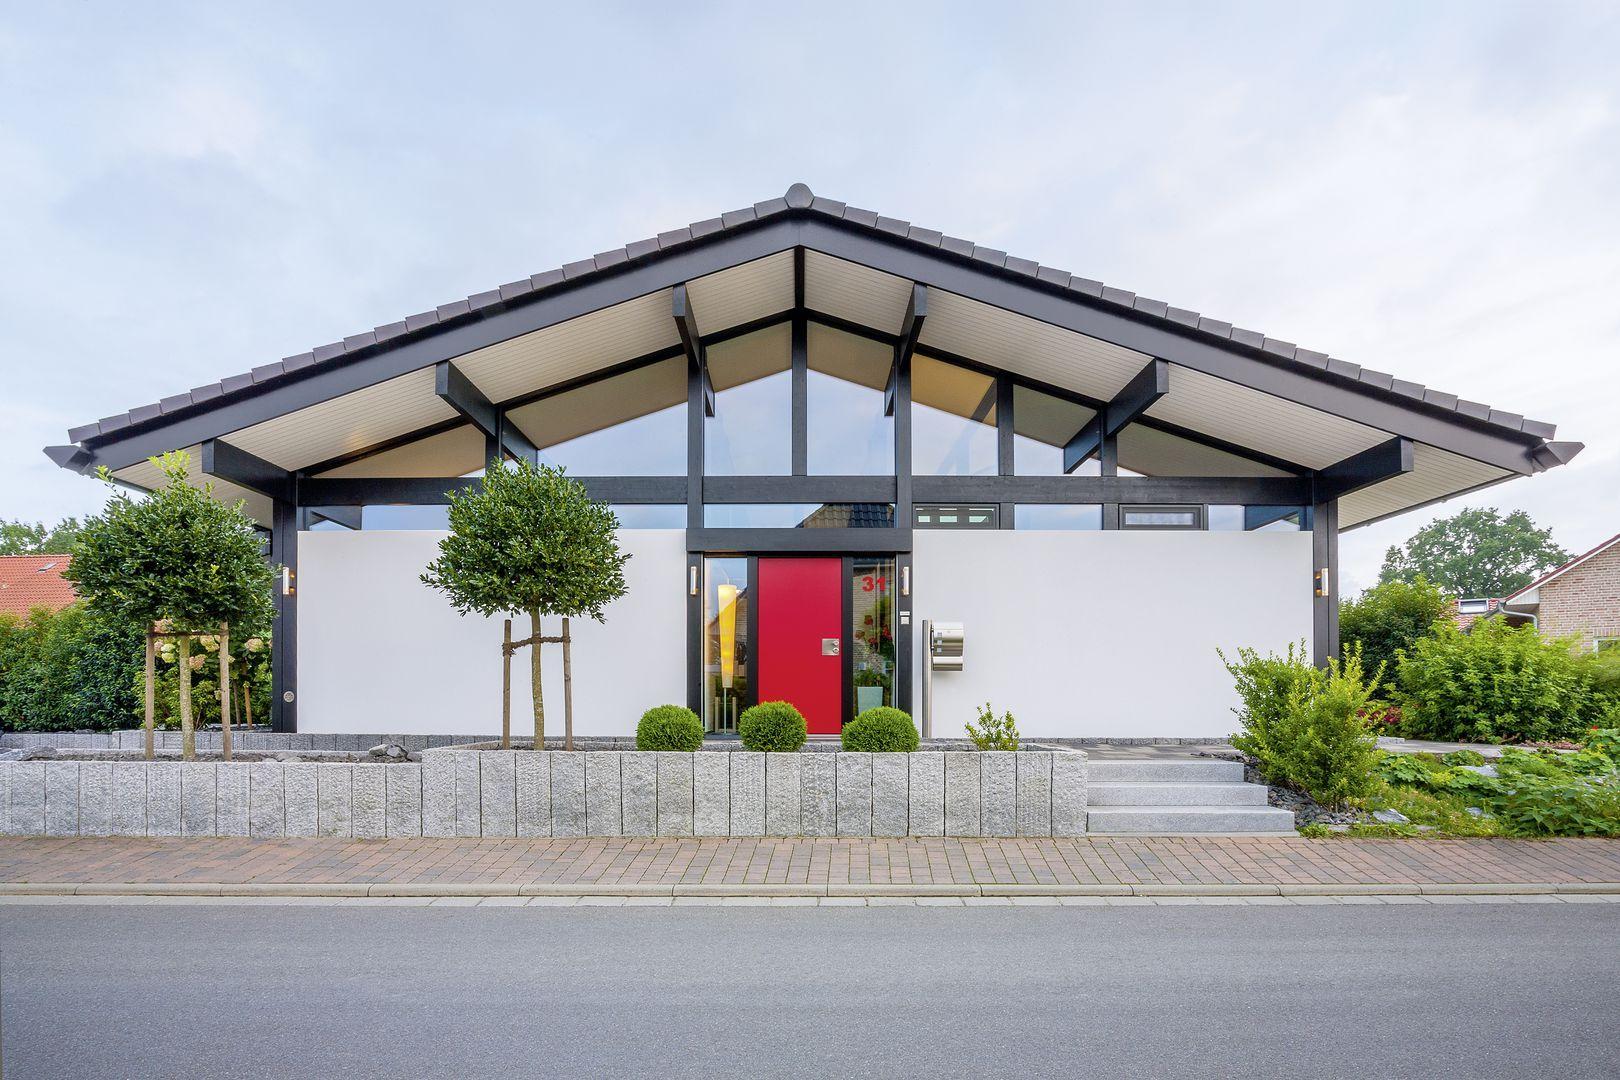 Modernes Hausdesign – Fotos zu Bewundern - https://trendomat.com ...